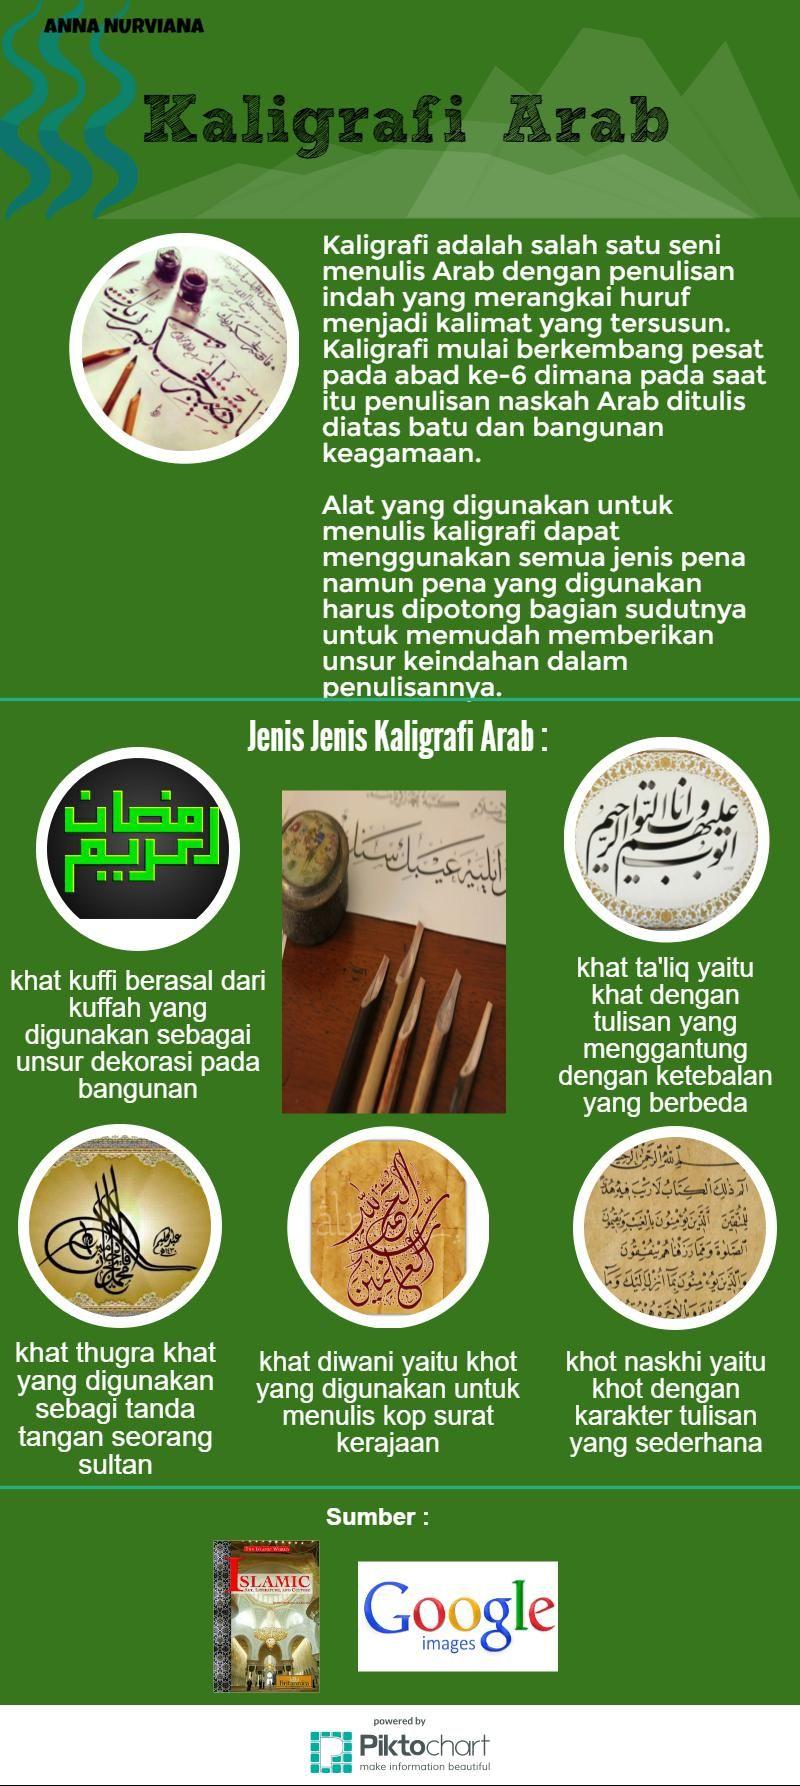 kaligrafi arab kaligrafiarab islam caligraphy